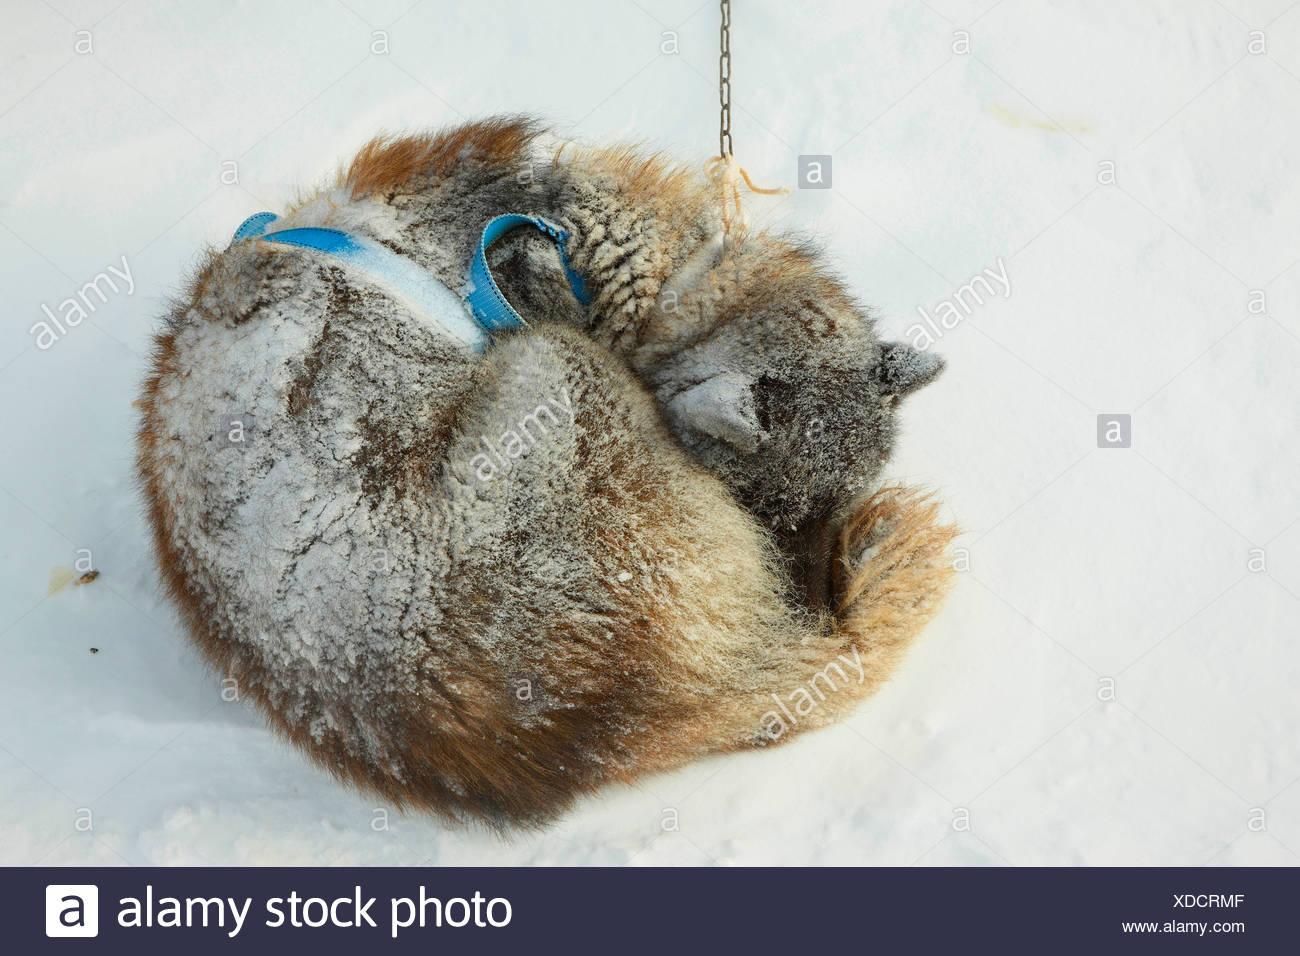 Greenland Dog (Canis lupus f. familiaris), coiled up in snow storm, Greenland, Ostgroenland, Tunu, Kalaallit Nunaat, Liverpool Land, Kap Hoegh Stock Photo